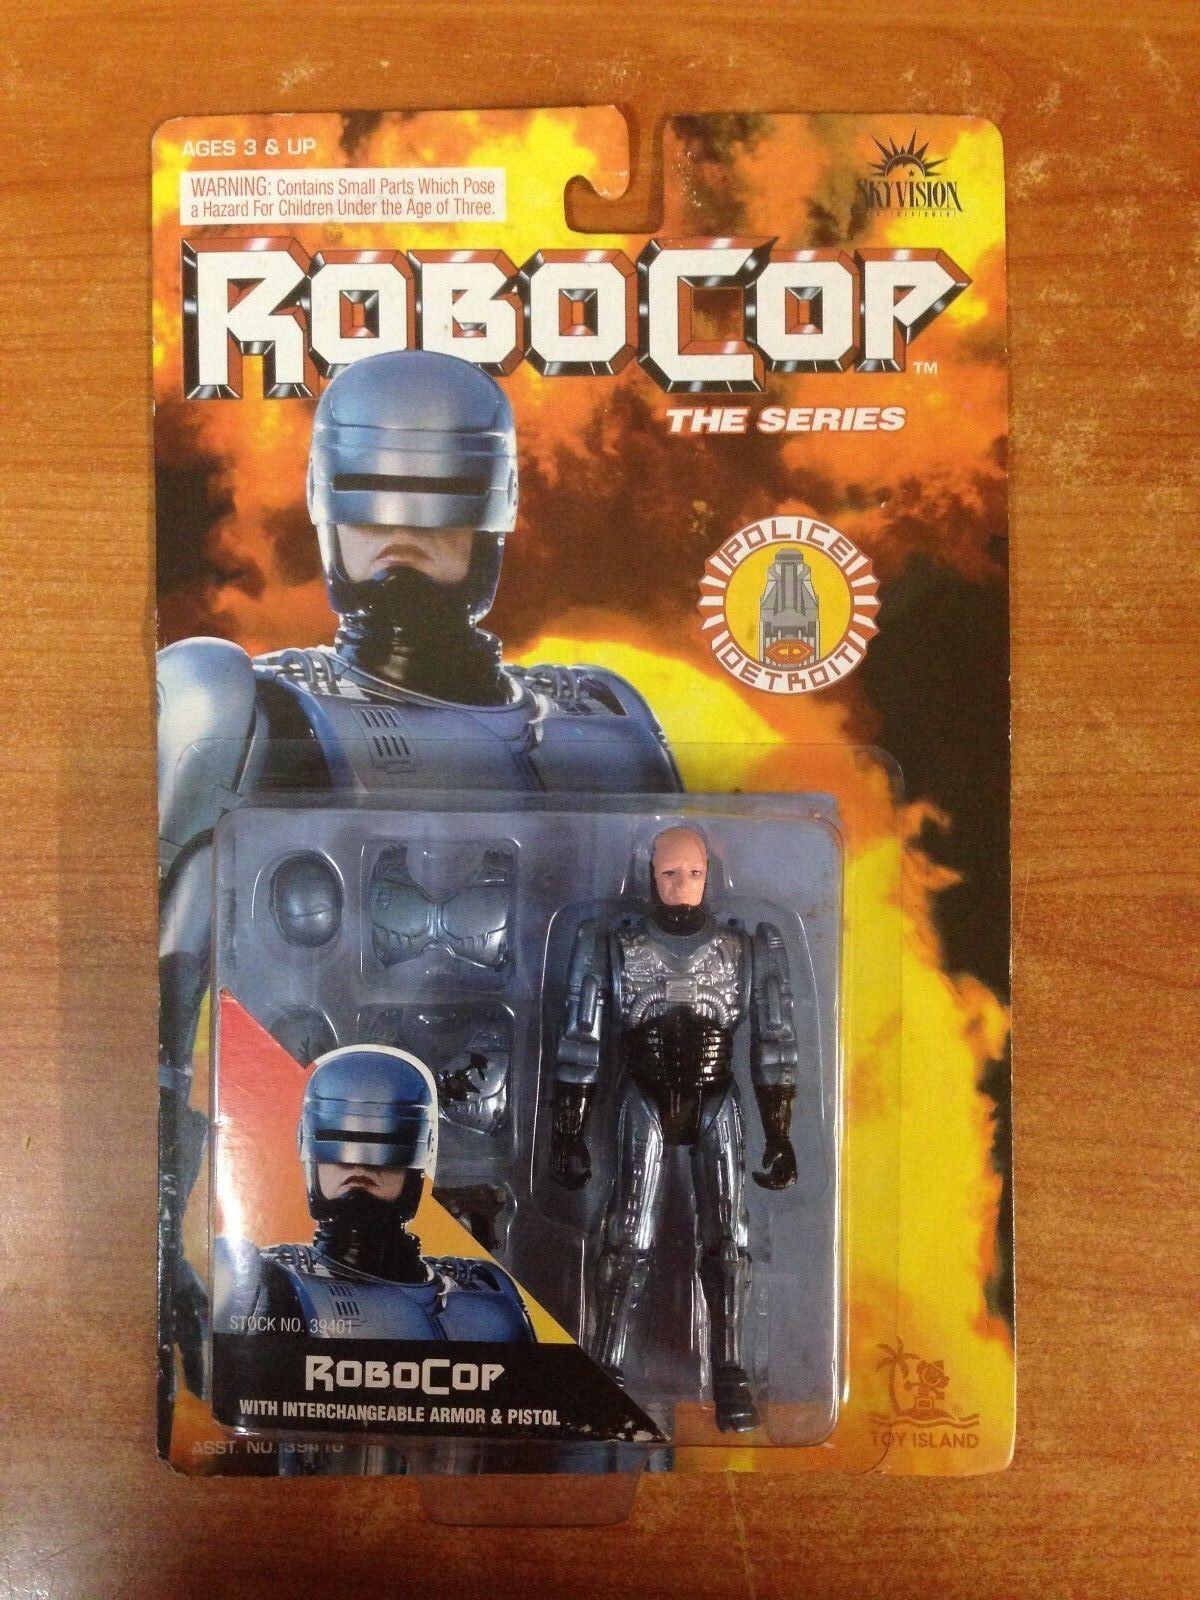 Vintage 1993 Electronic Robocop Robocop Robocop The Series Action Figure Robocop MOSC b29ff9